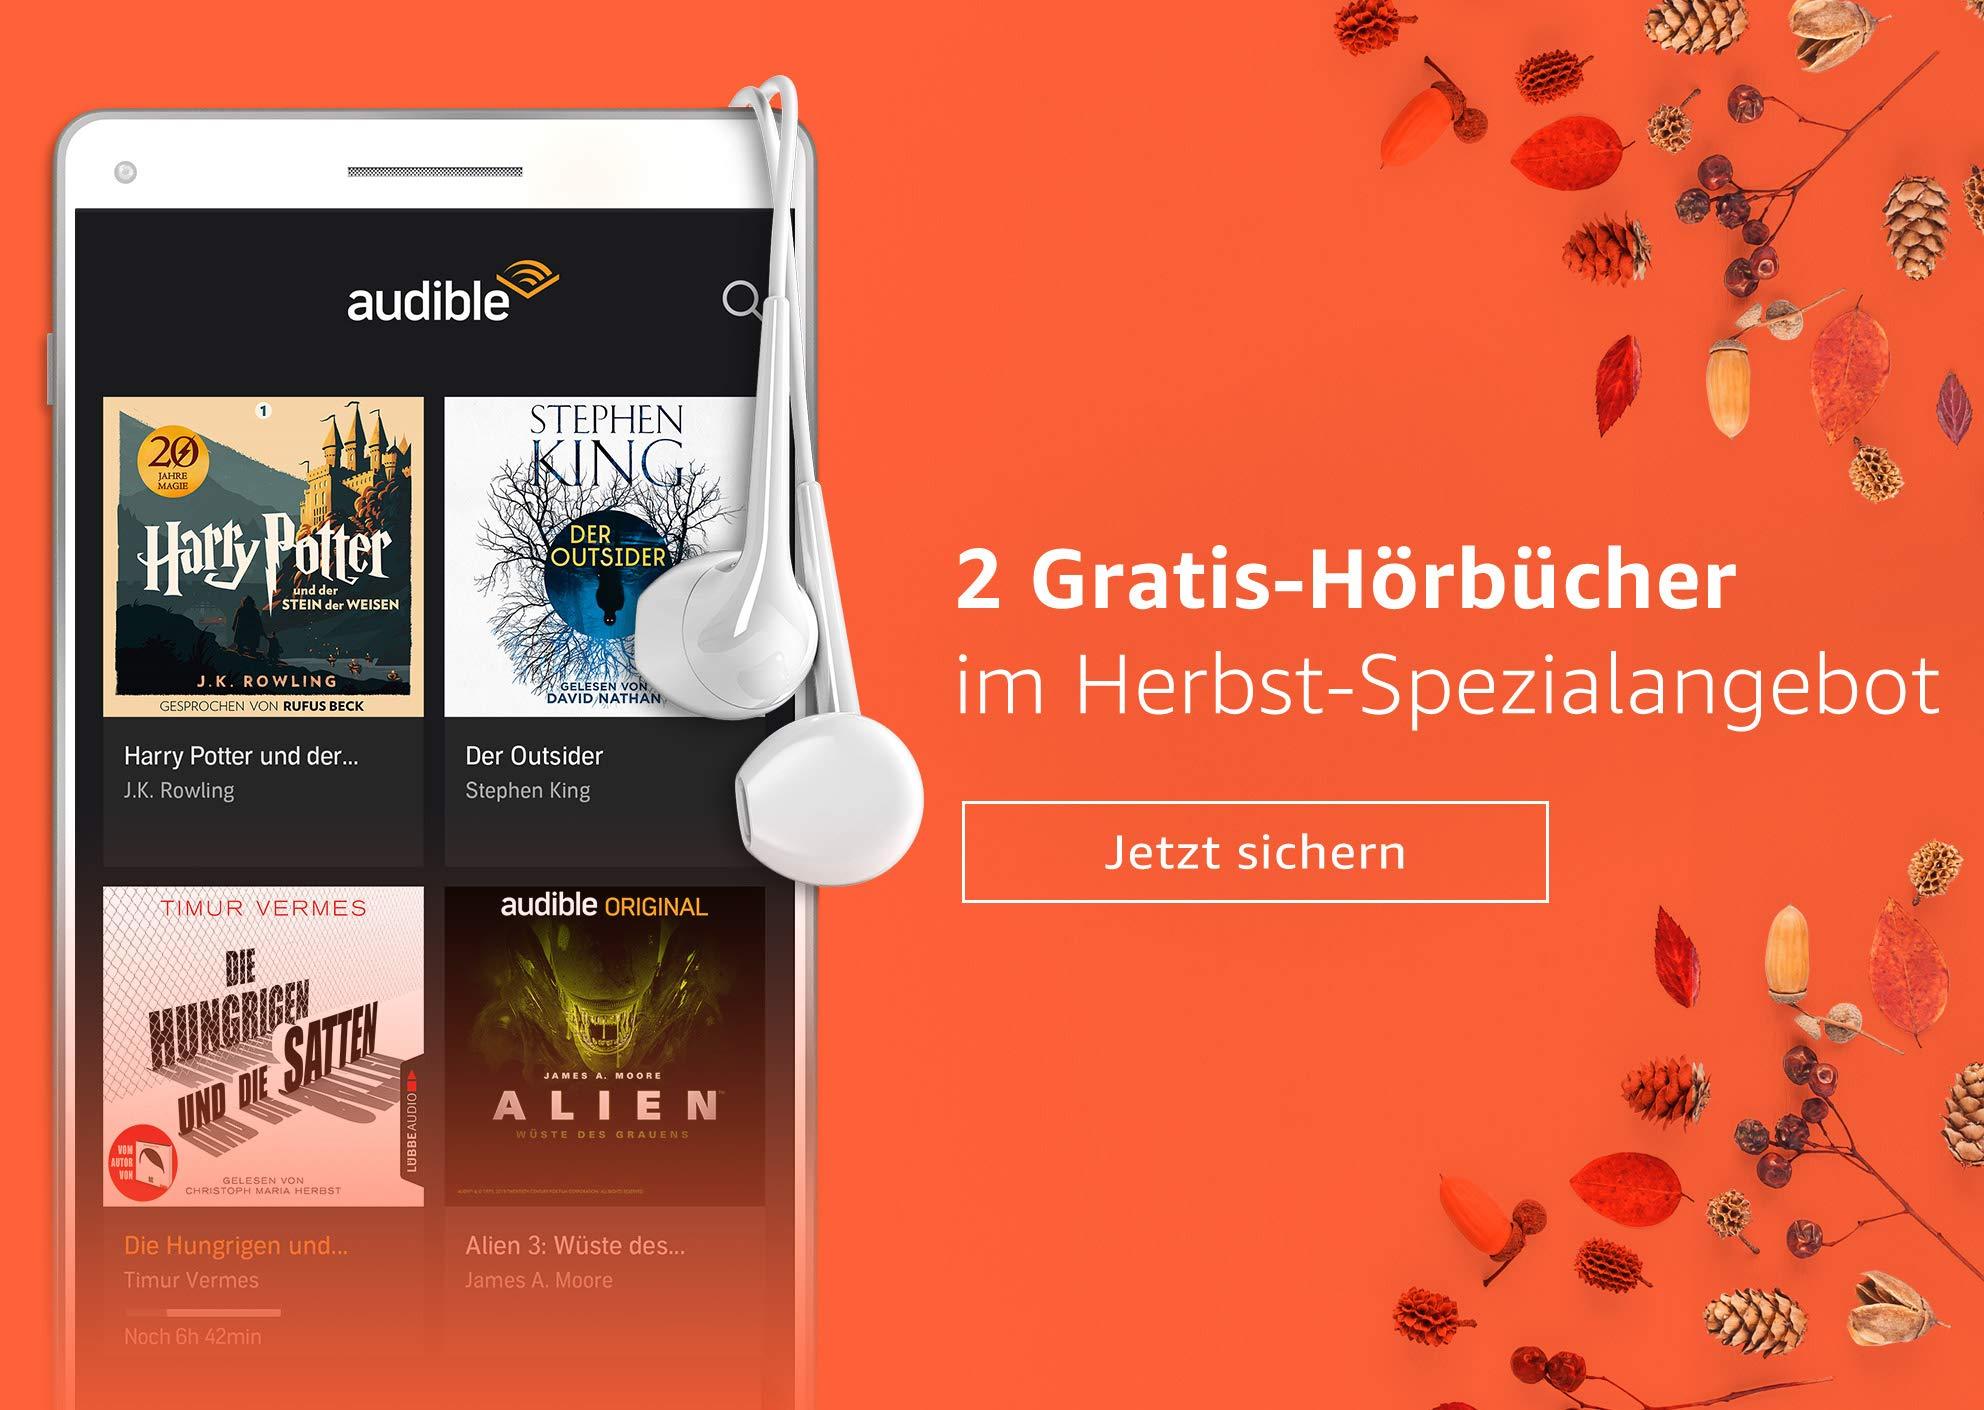 Herbstangebot: 2 Gratis-Hörbücher